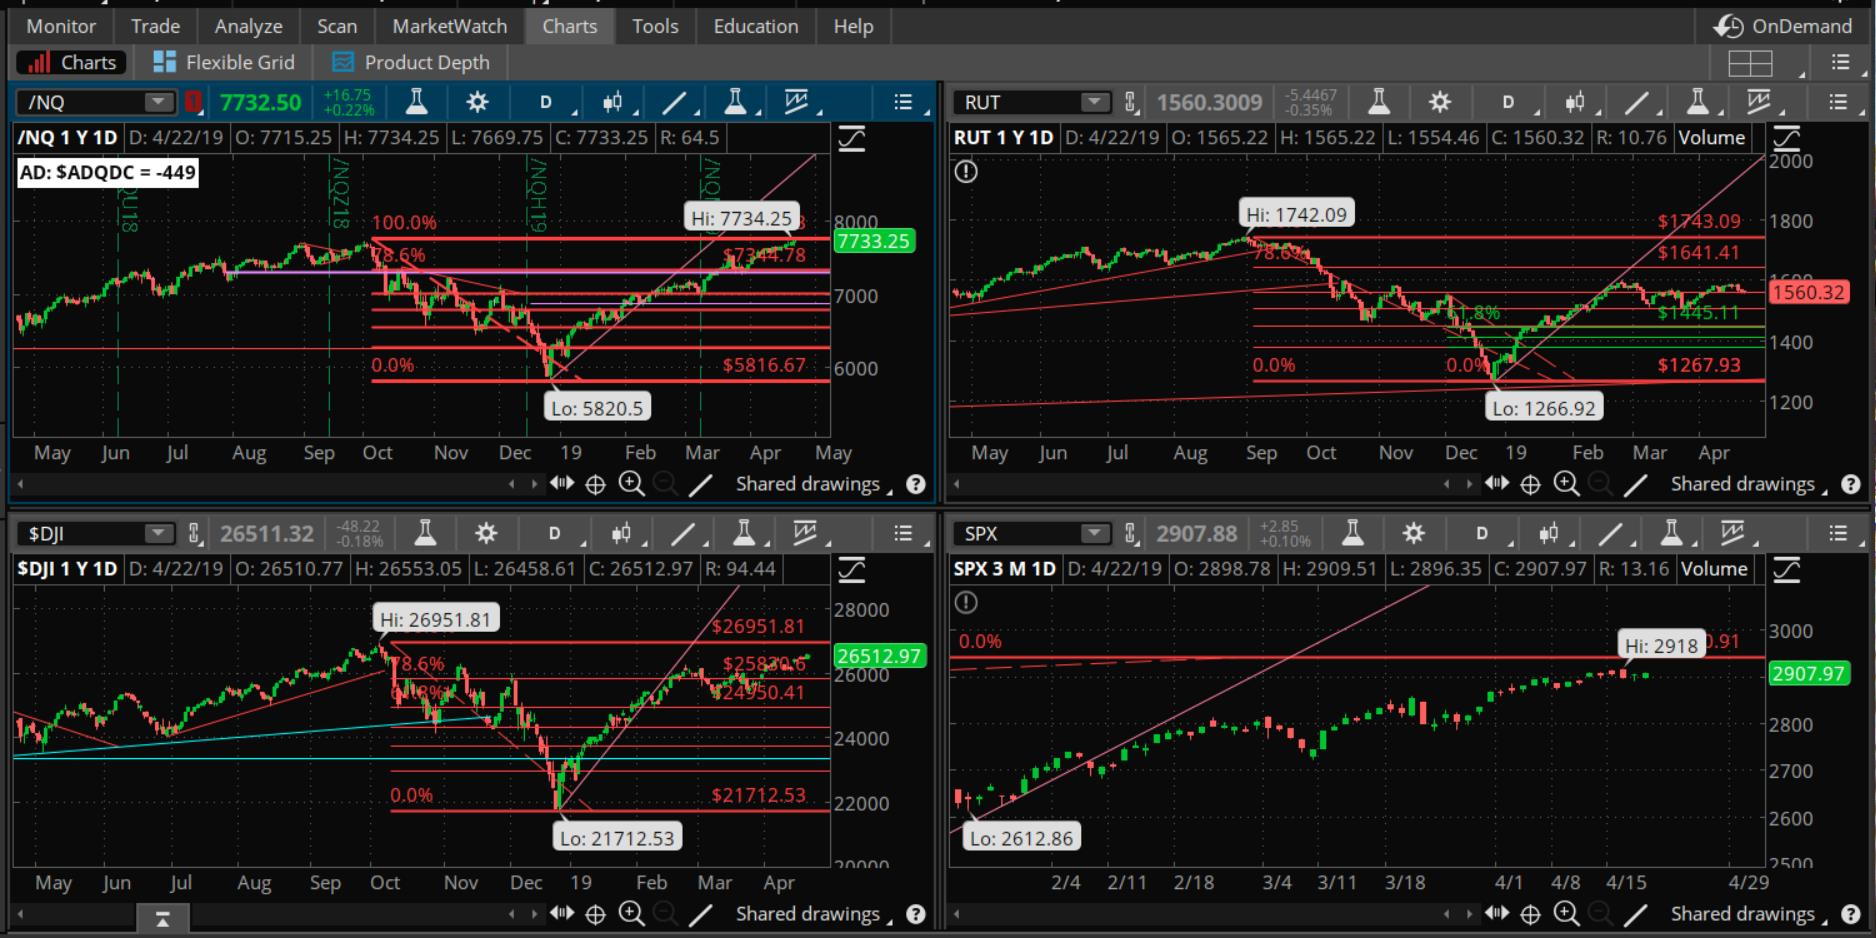 DTT-April22_2019refer » Doc's Trading Tools